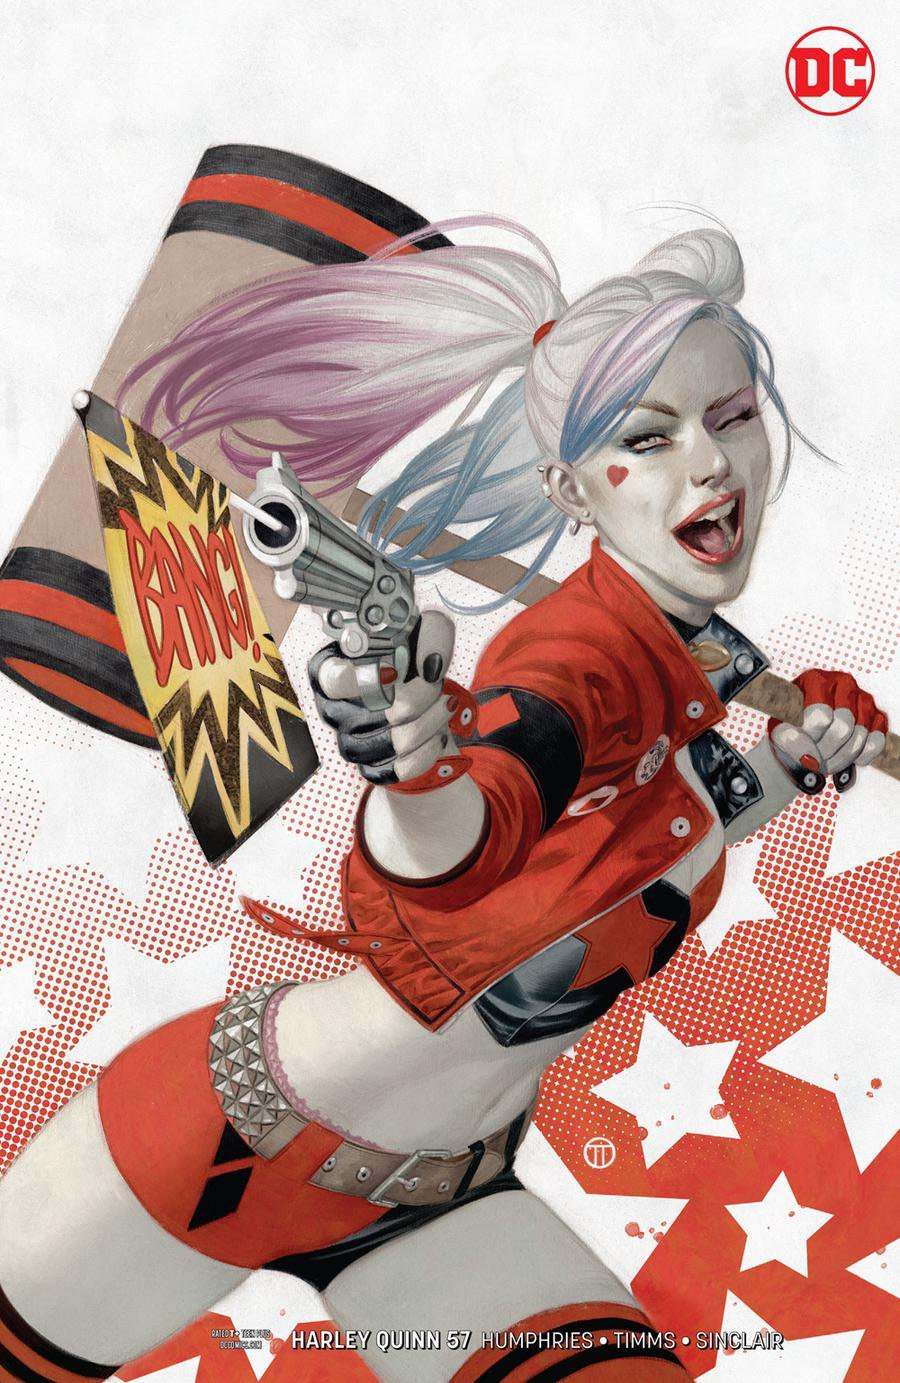 Harley Quinn #57